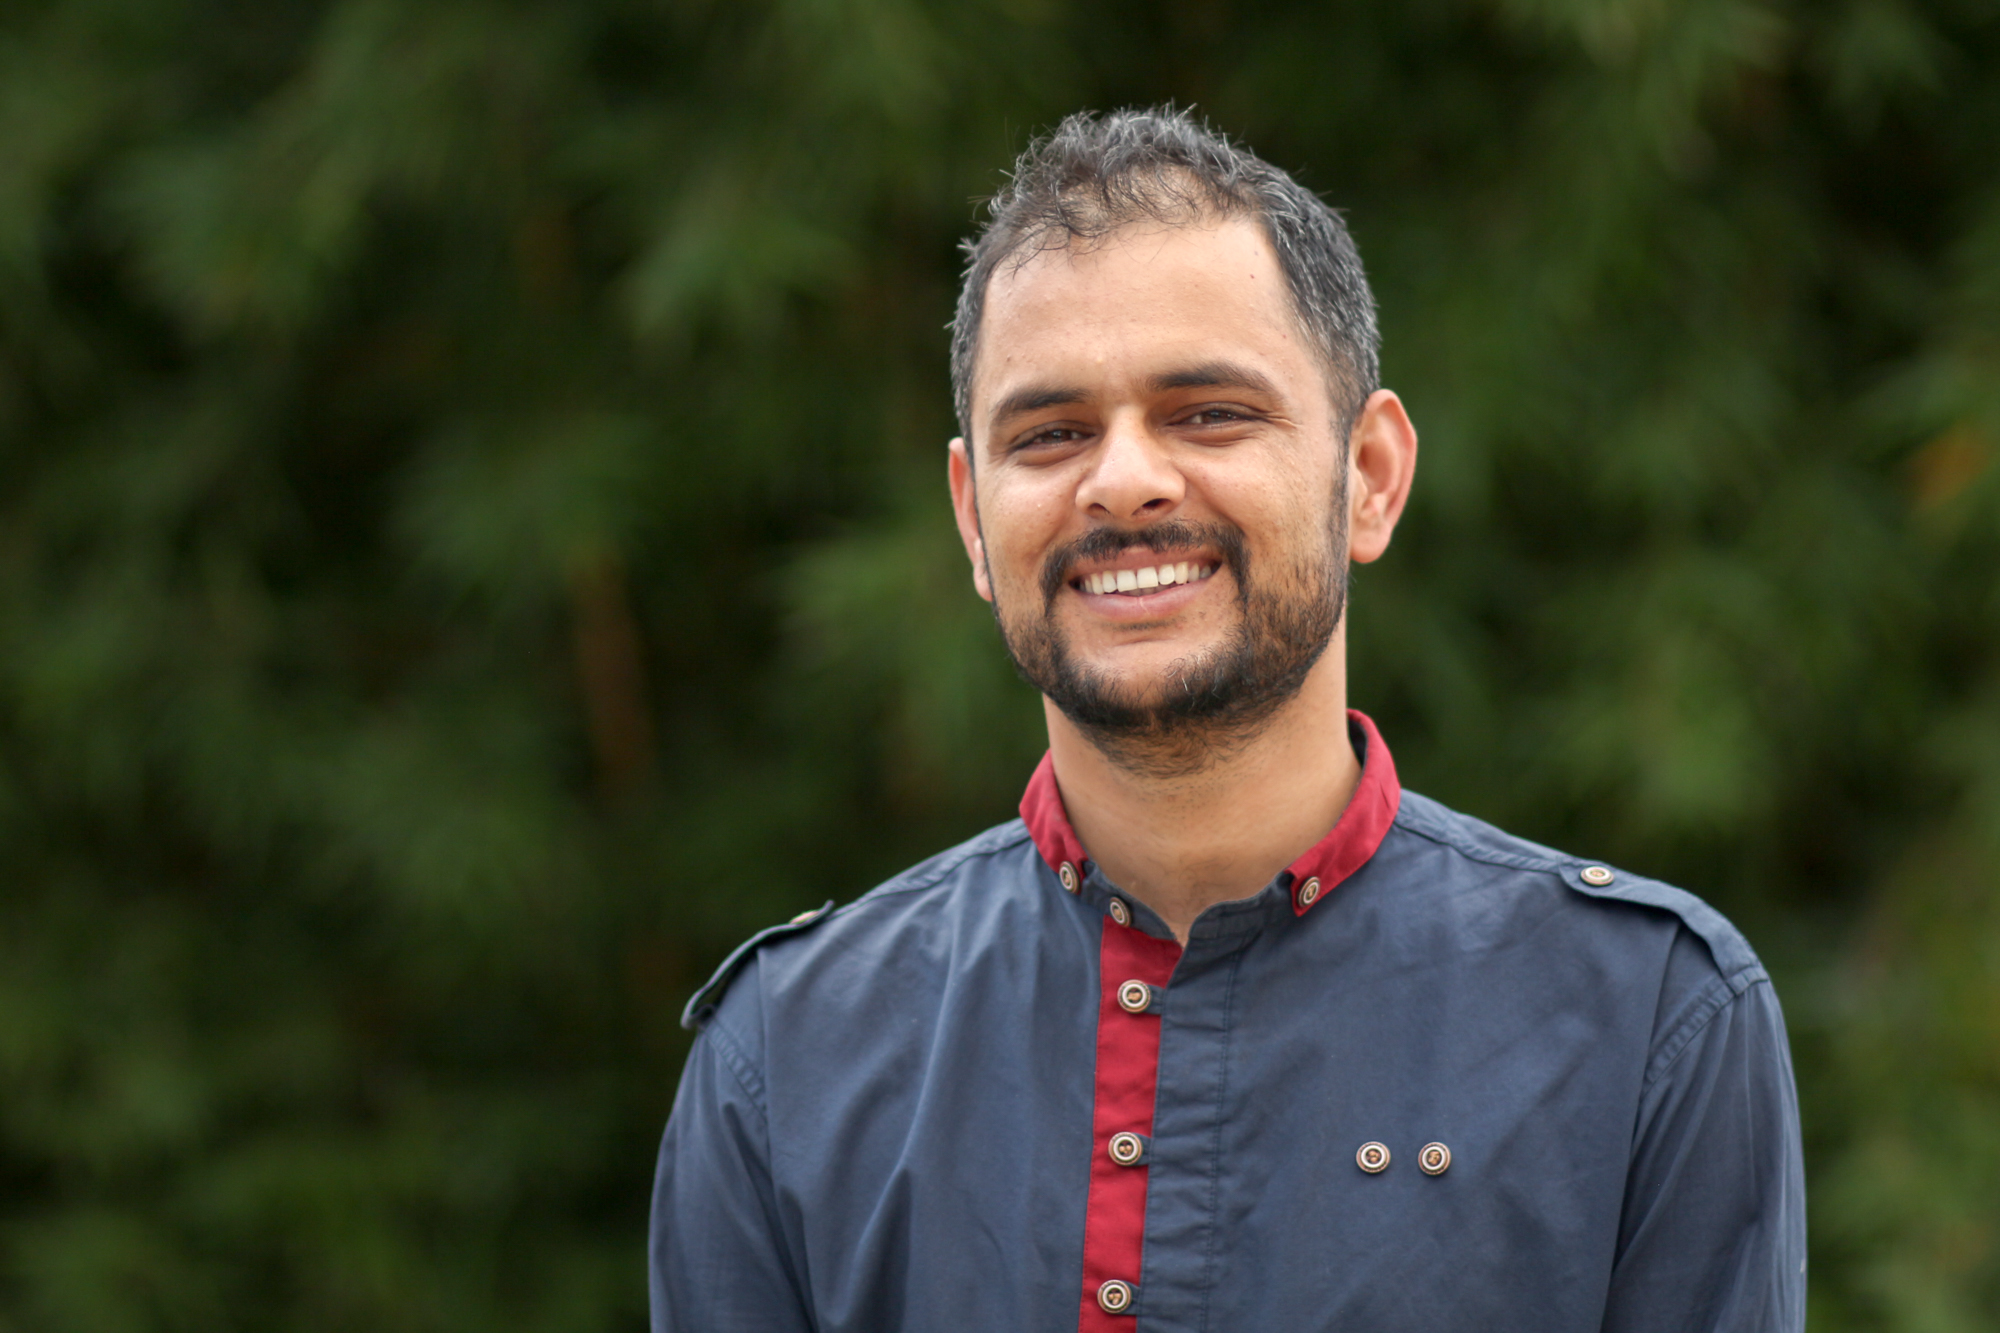 Sudip Sigdel, Psychosocial Counselor